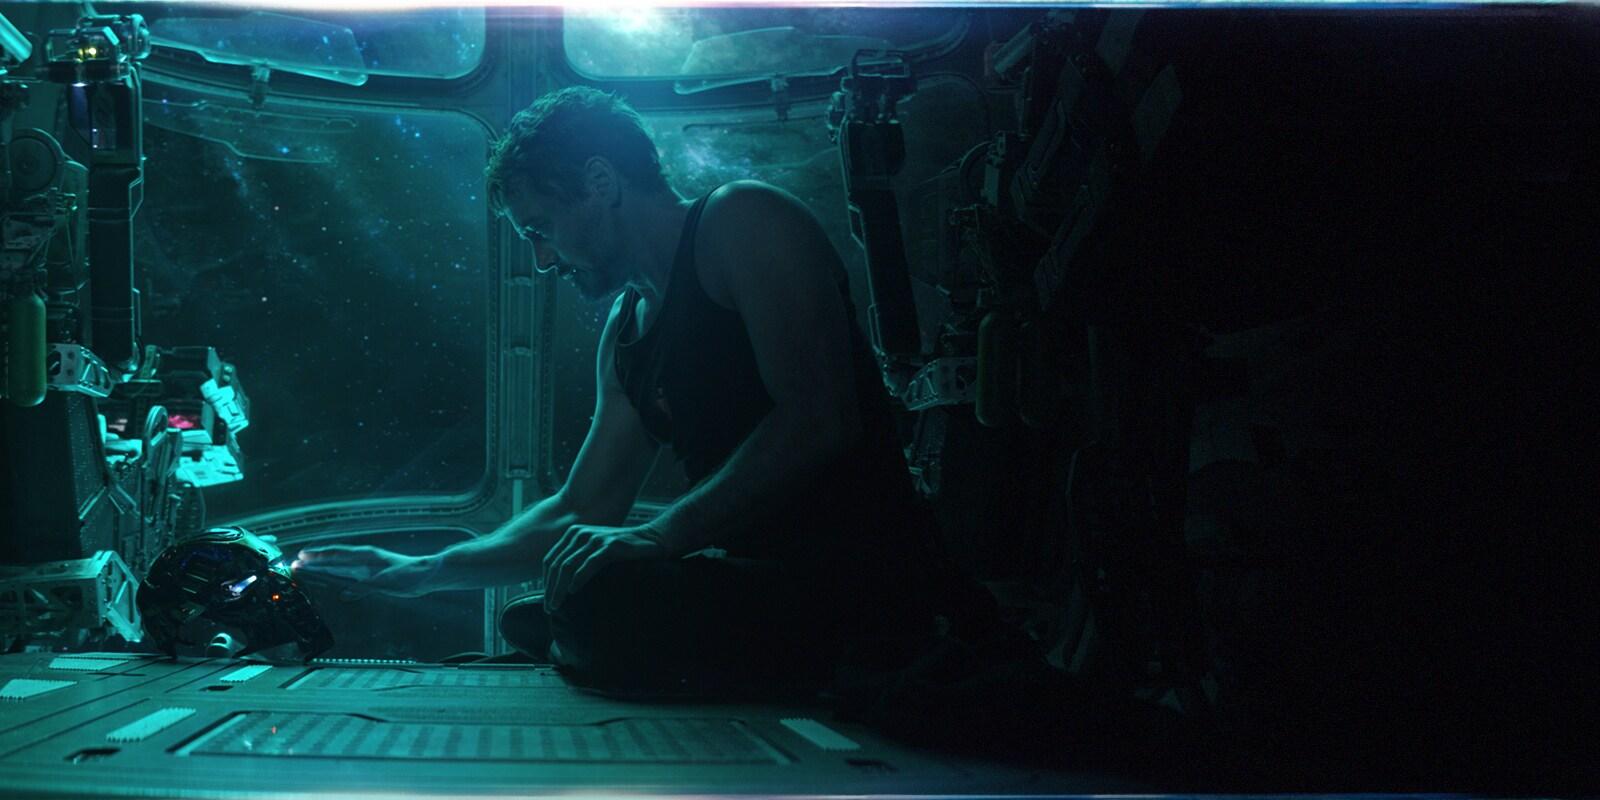 Sinopsis de Avengers: Endgame